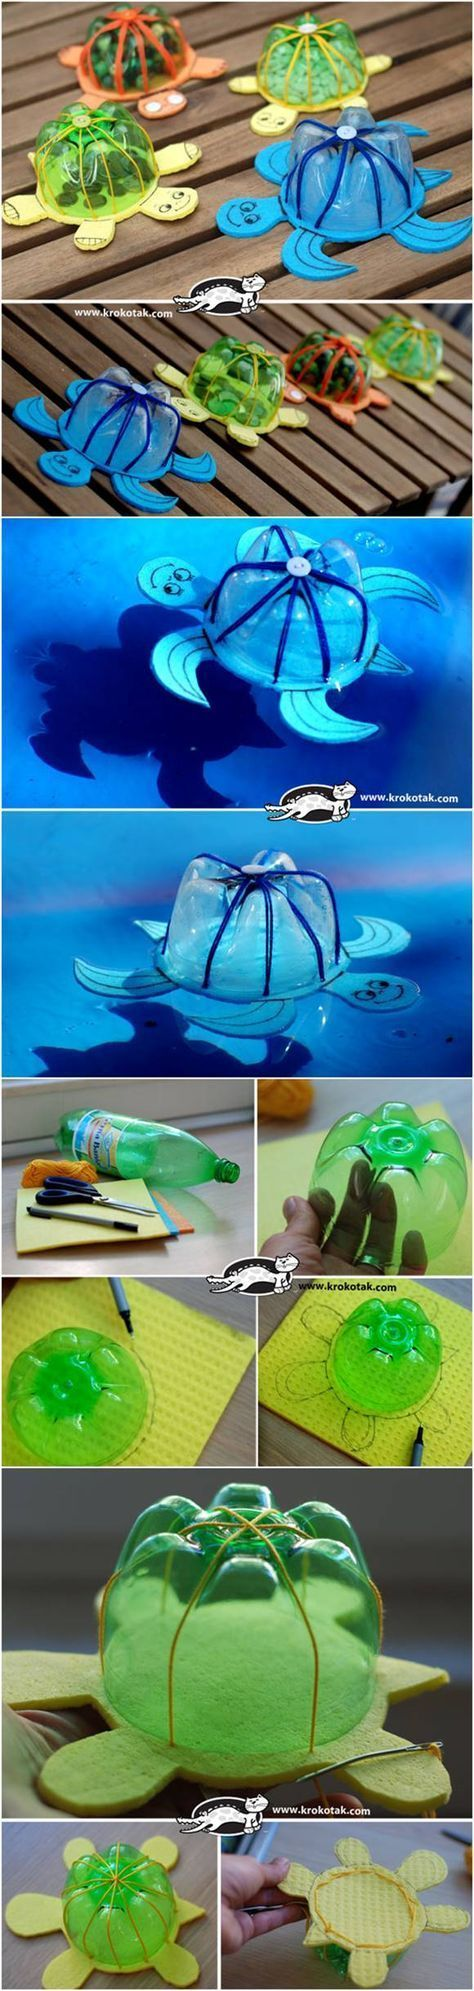 Sensorik-Regenschirm - Diy Spielzeug Zur Beschäftigung Für Euer Baby Sensorik-Regenschirm - DIY Spielzeug zur Beschäftigung für euer Baby Diy Toys diy toys for toddlers